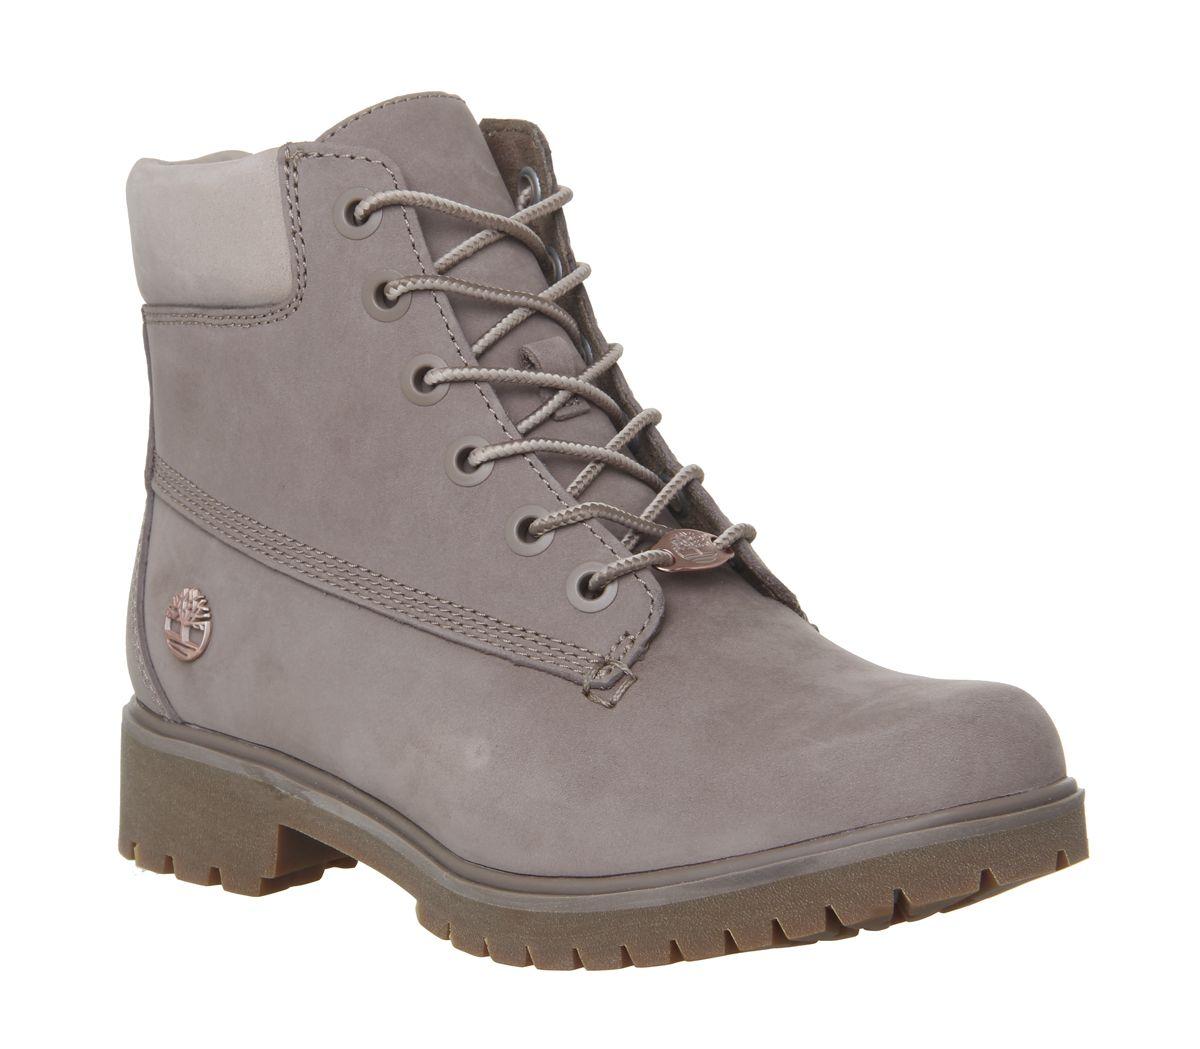 8298a211d30 Slim Premium 6 Inch Boots